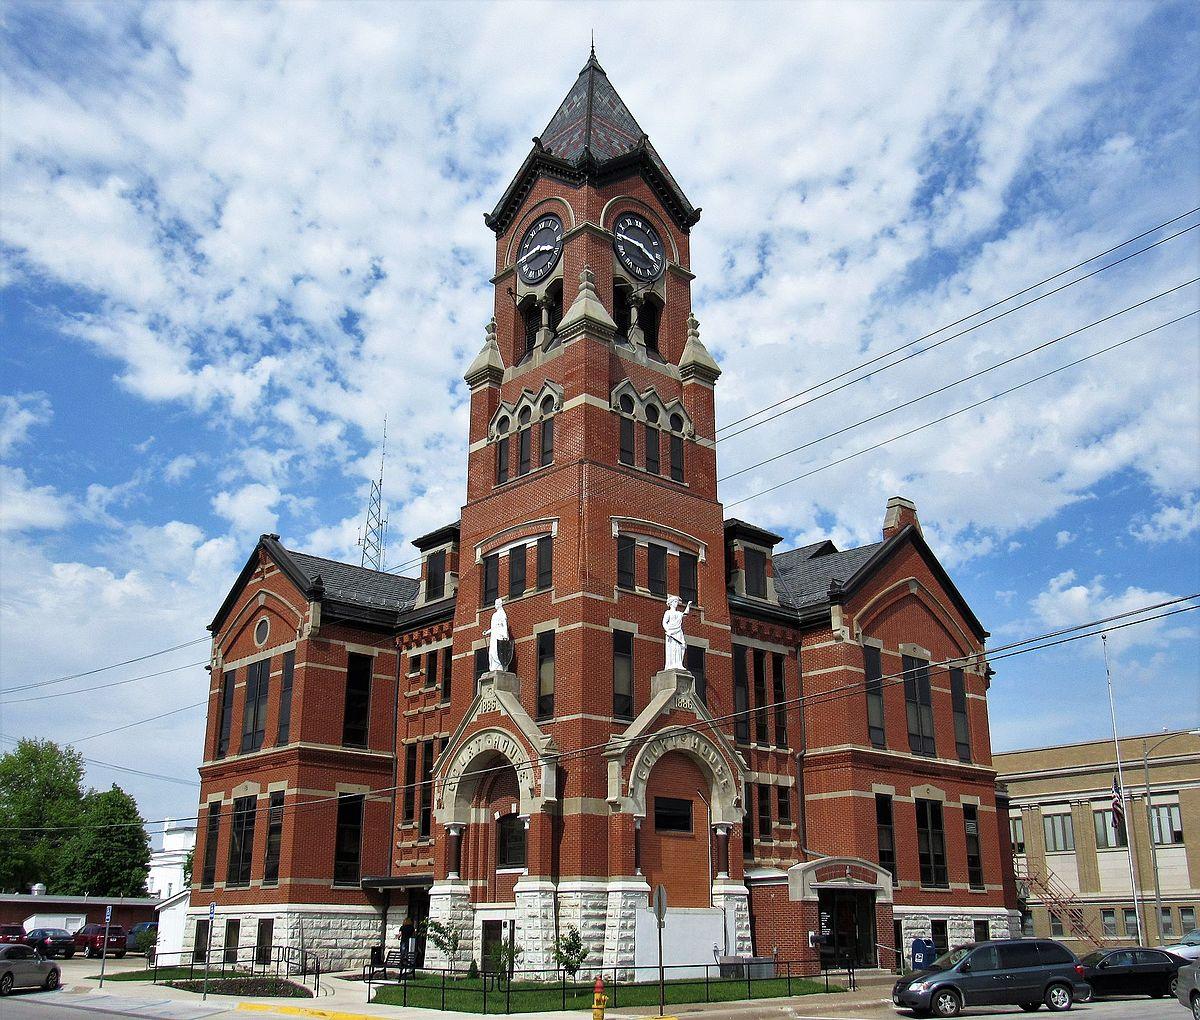 Washington County Property Search